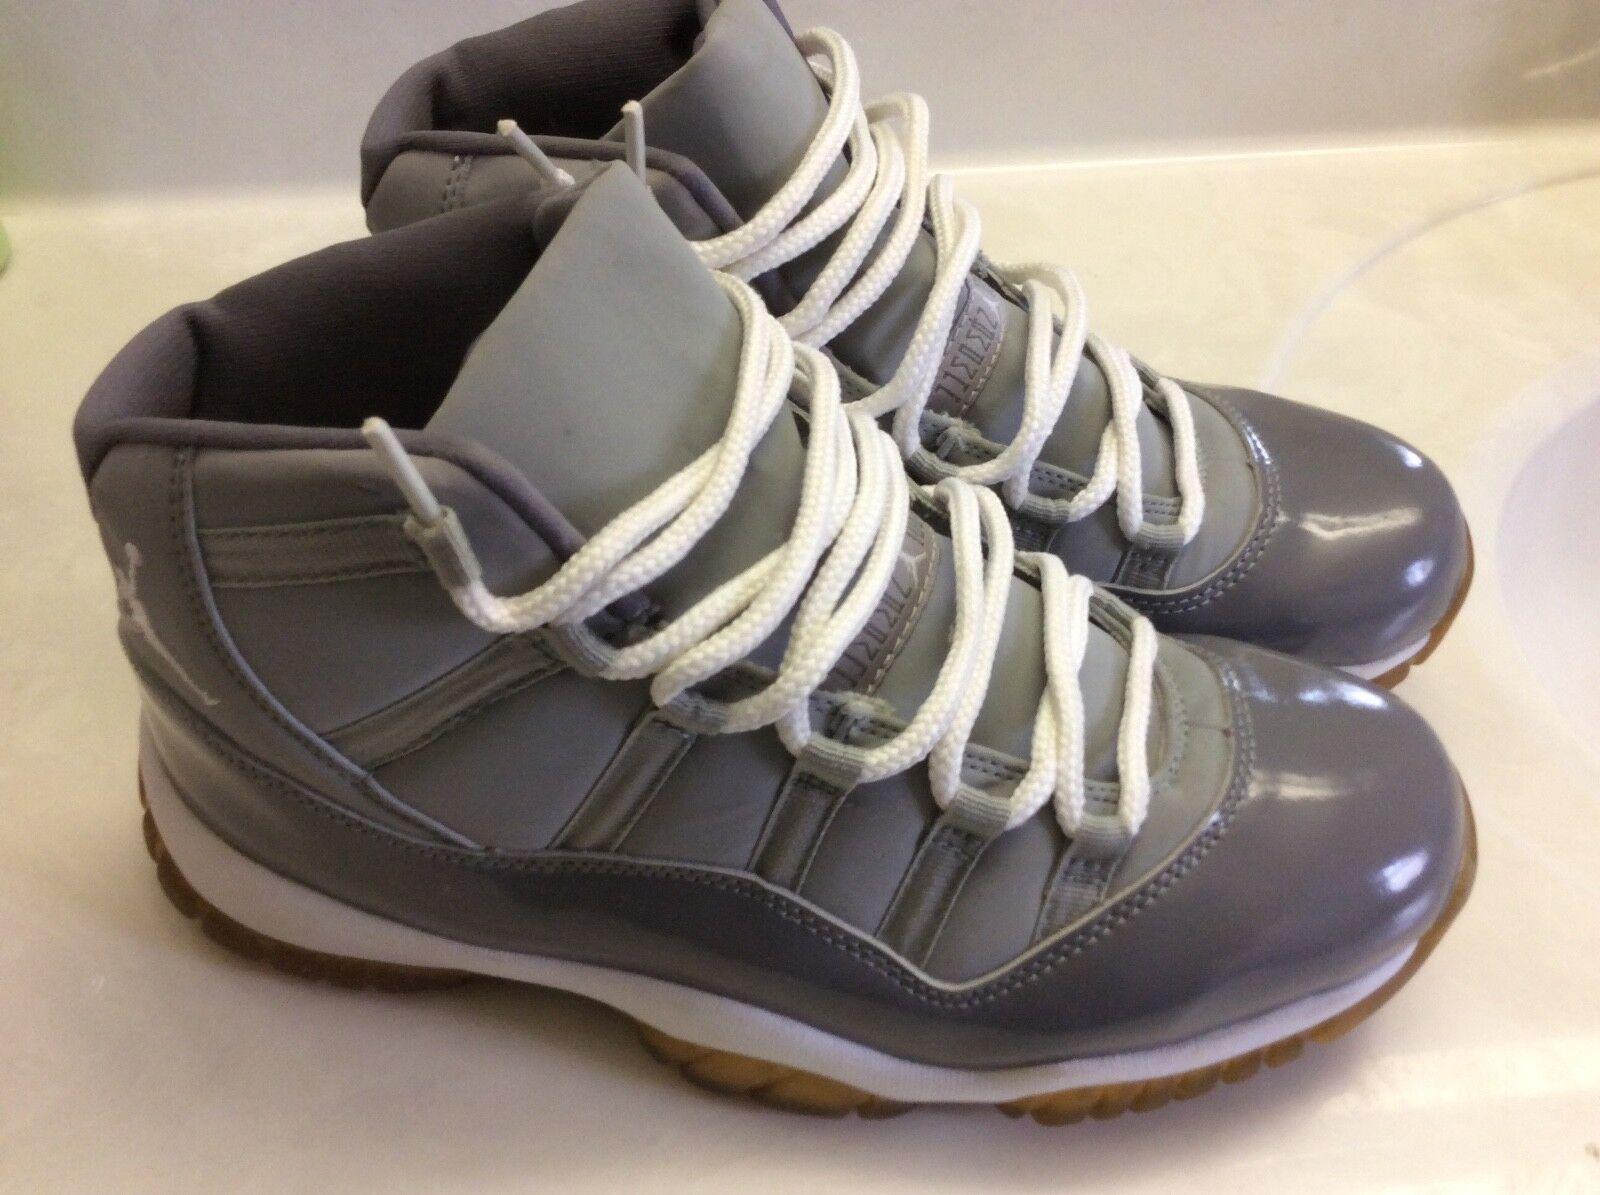 2001 Jordan Retro 11 Cool Grey size 10